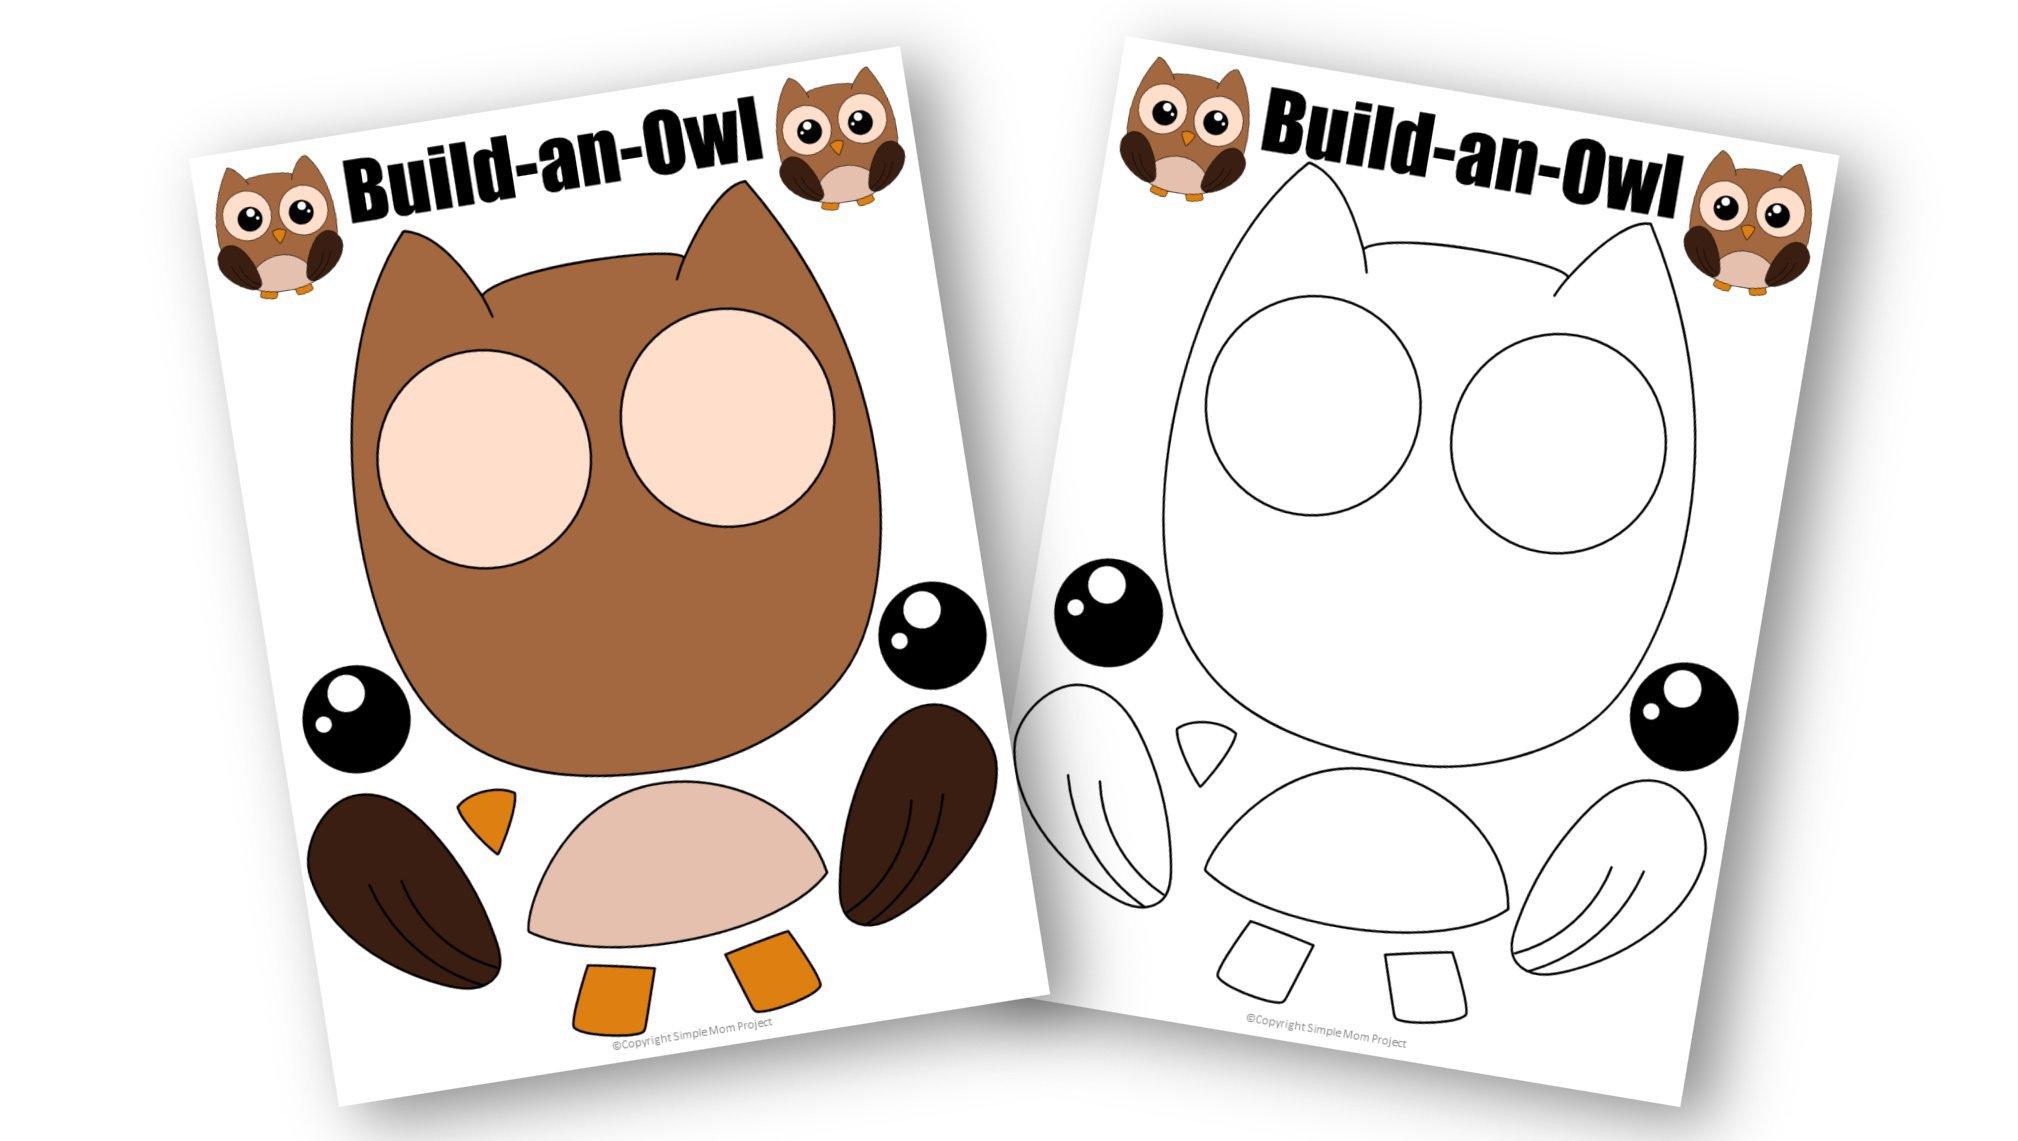 Free Printable Owl Craft Template for kids, preschoolers, toddlers and kindergartners